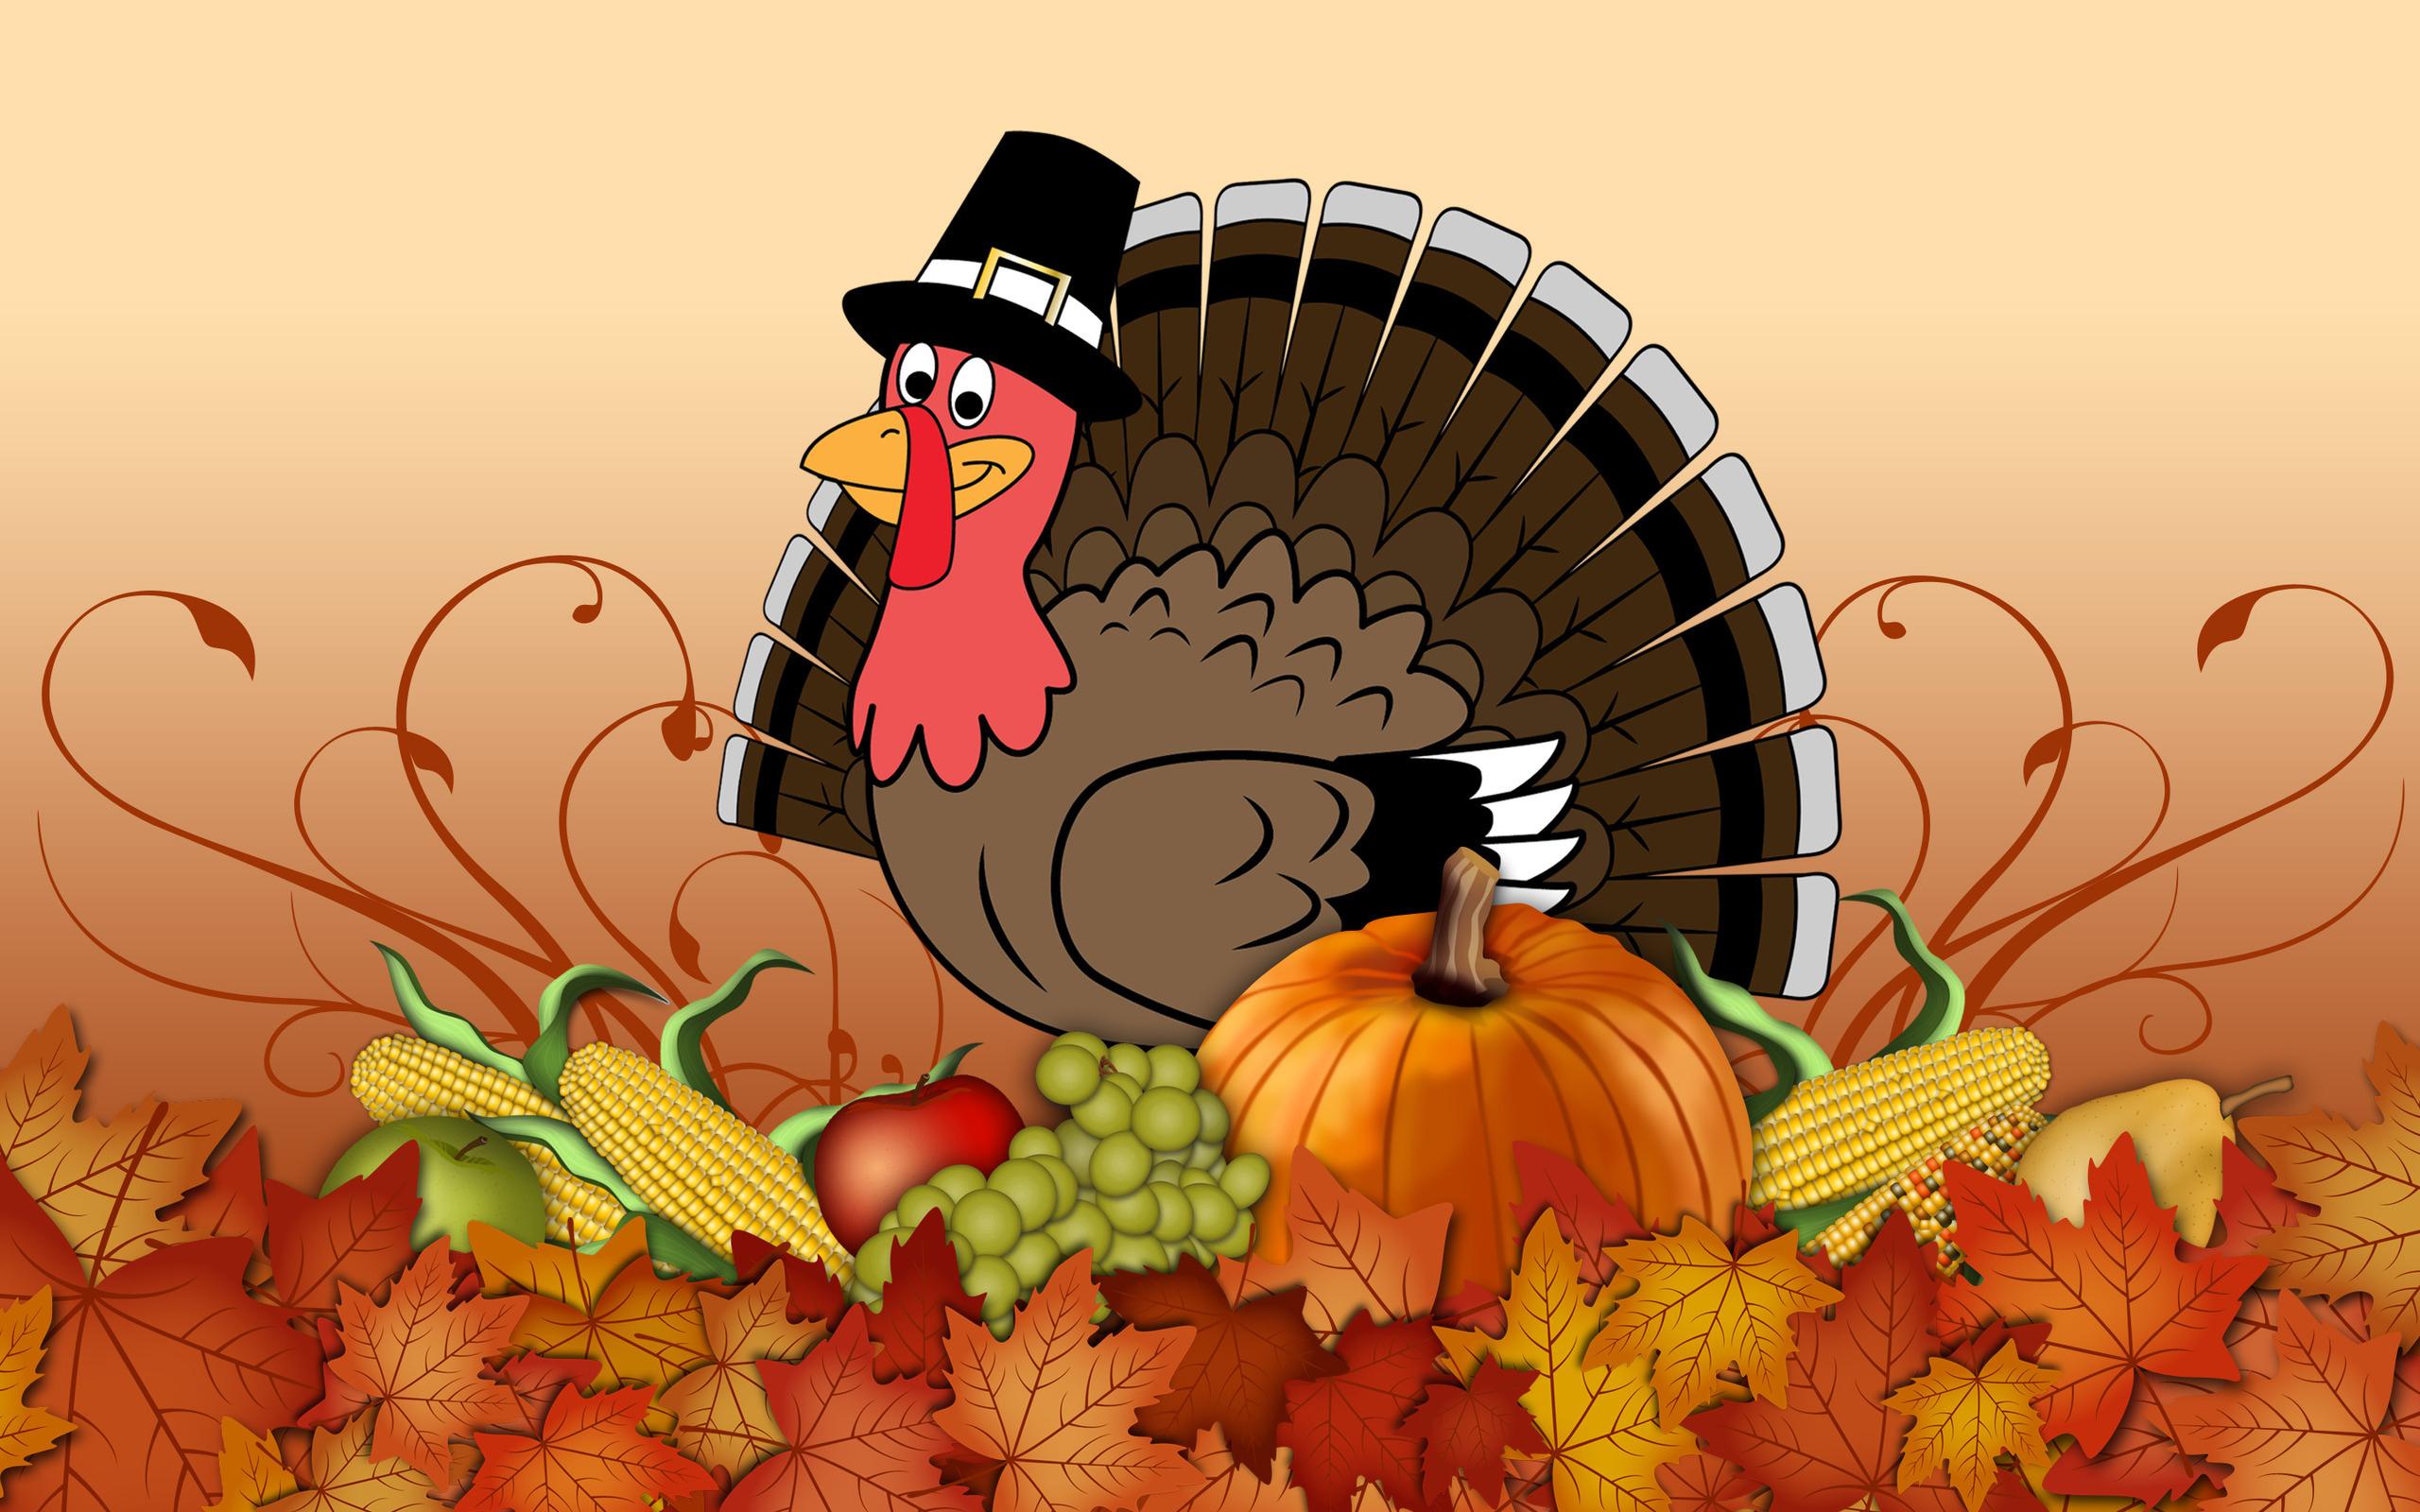 Happy-Thanksgiving-Turkey-wallpaper - Suburban Toppers